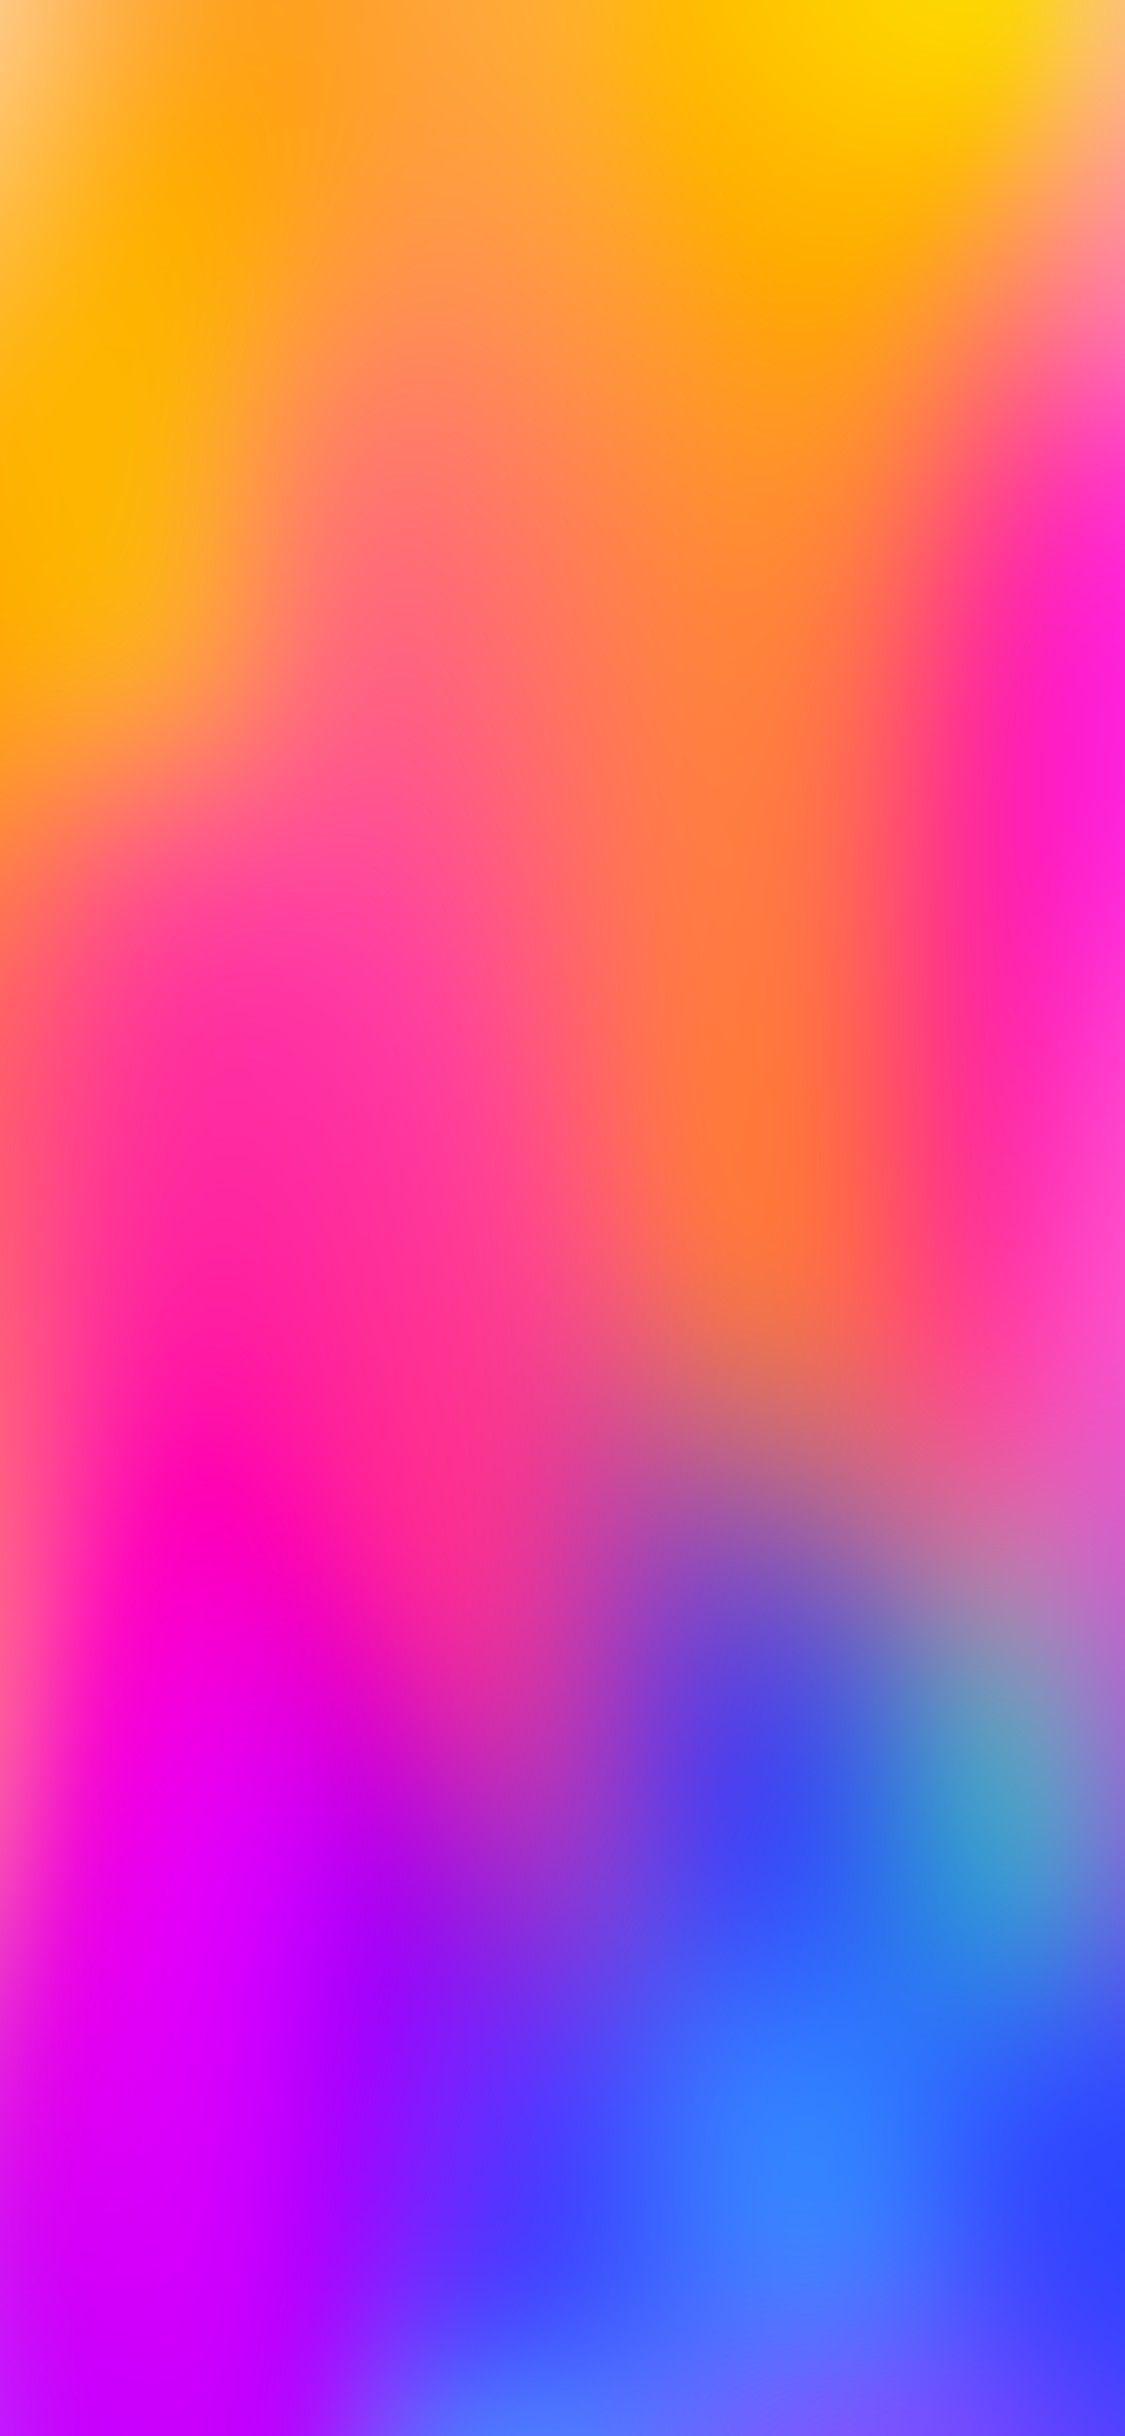 Wallpaper Ombre Wallpaper Iphone Plain Wallpaper Iphone Hd Wallpaper Android